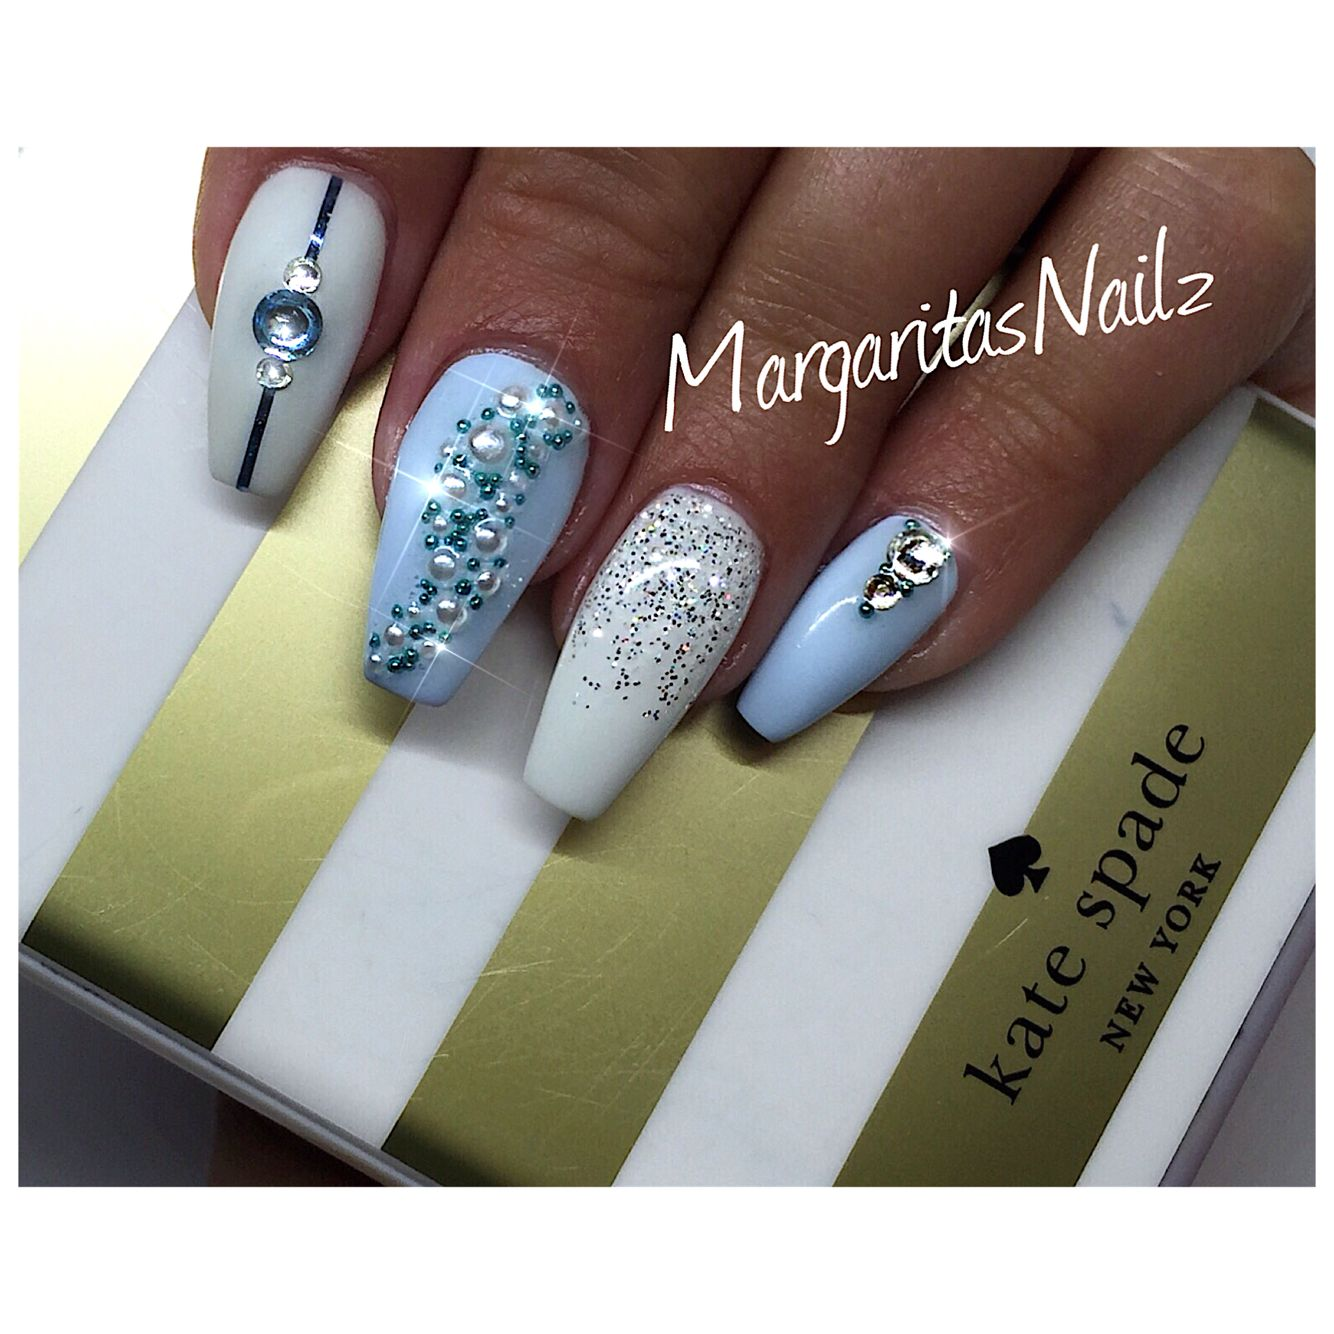 Pastel blue and white ballerina nails   Nails   Pinterest